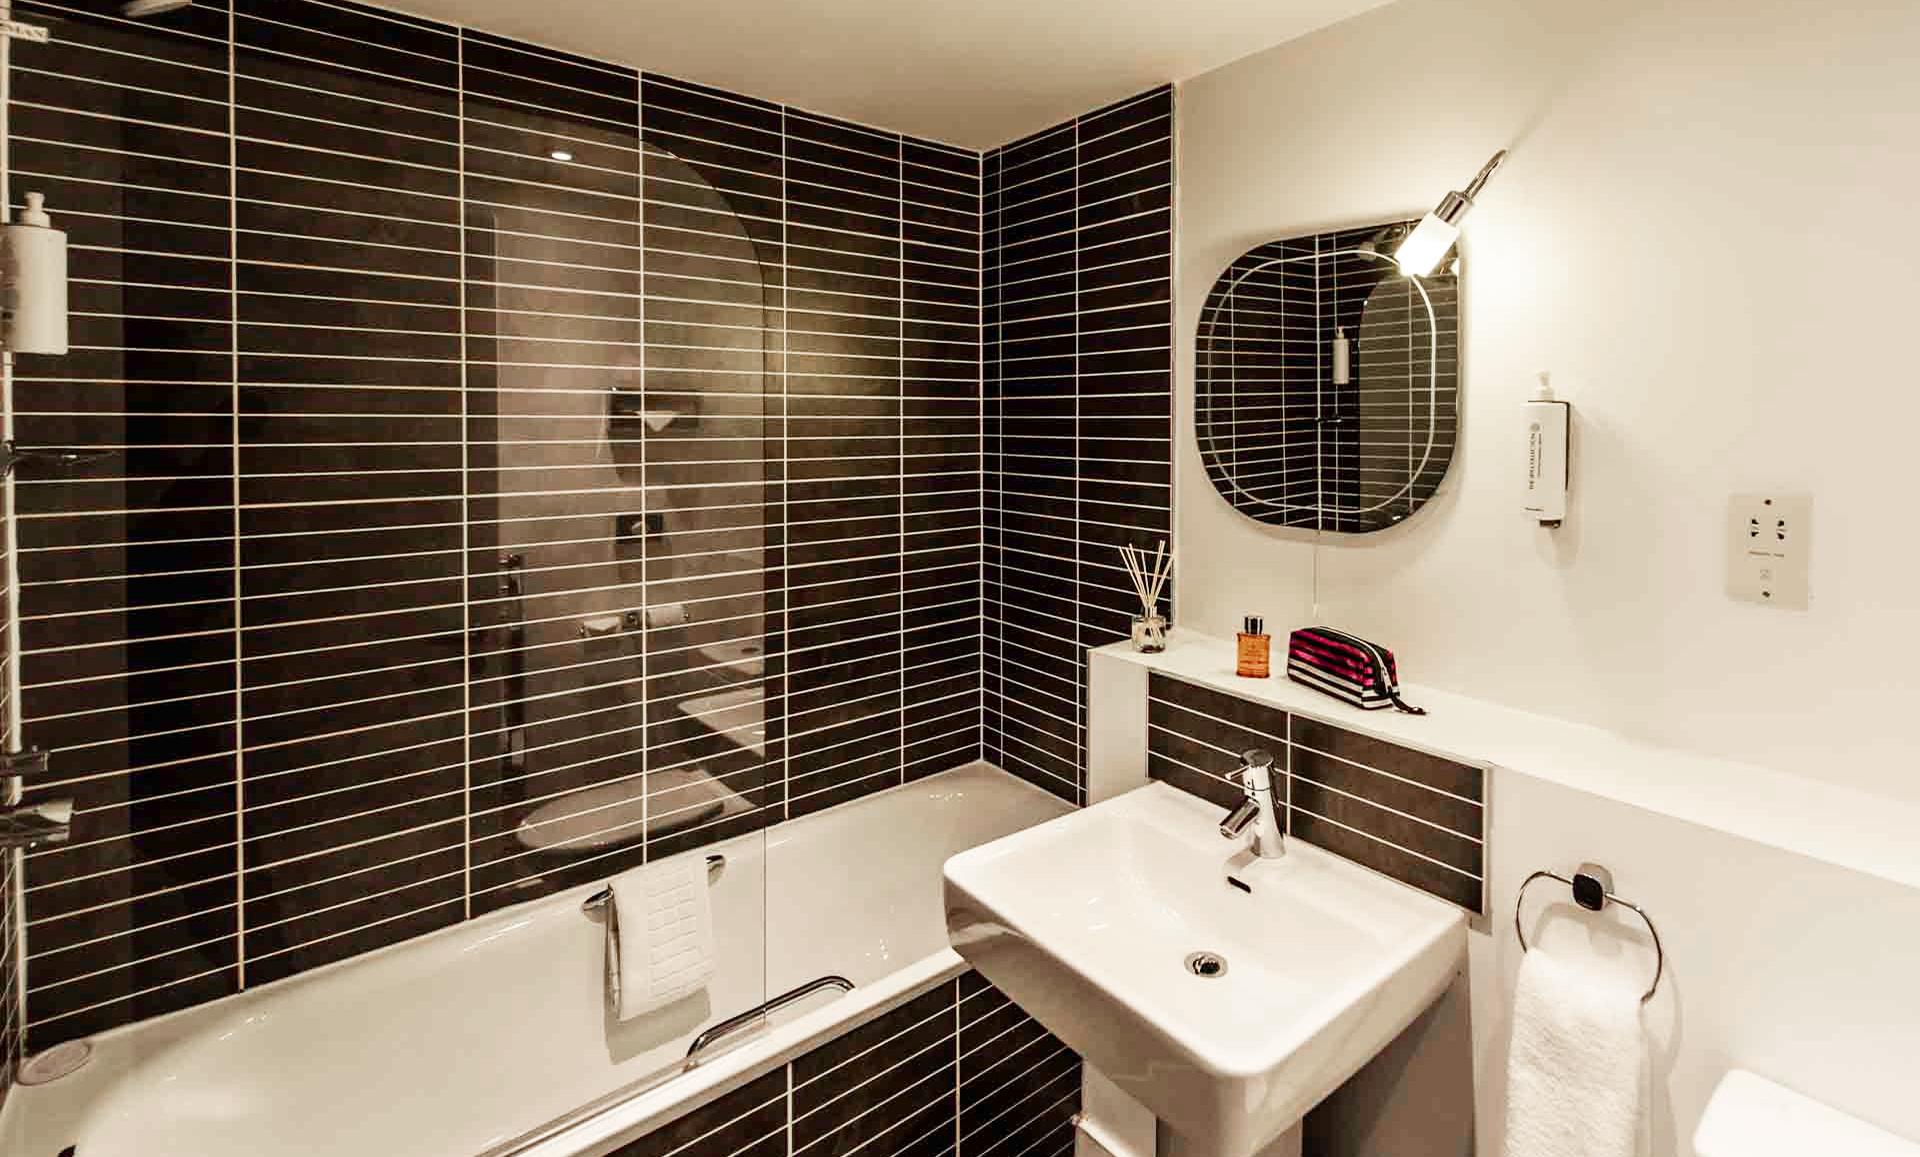 Bathrooms at Premier Suites Liverpool